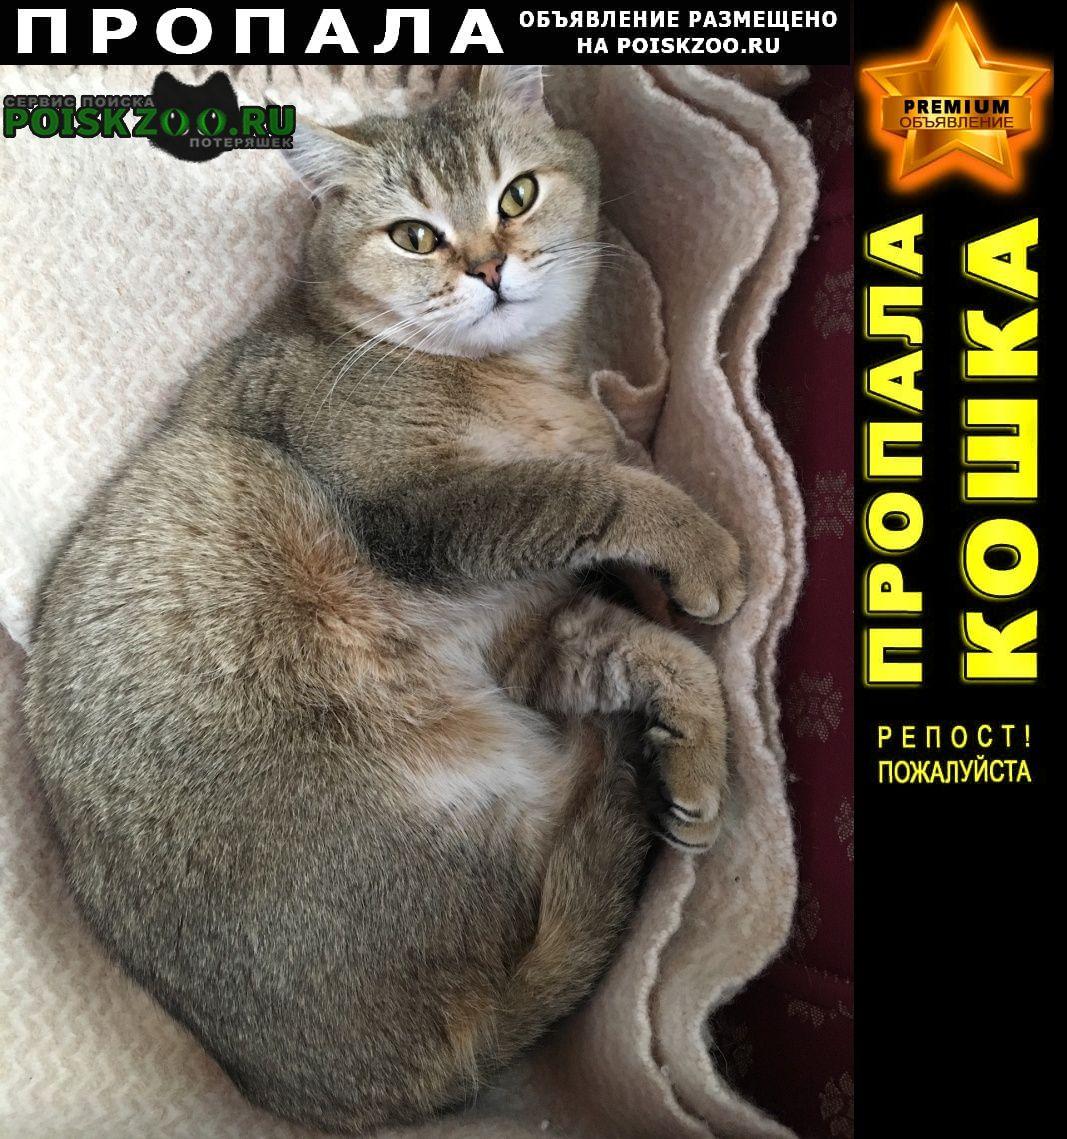 Зеленогорск (Ленинградская обл.) Пропала кошка